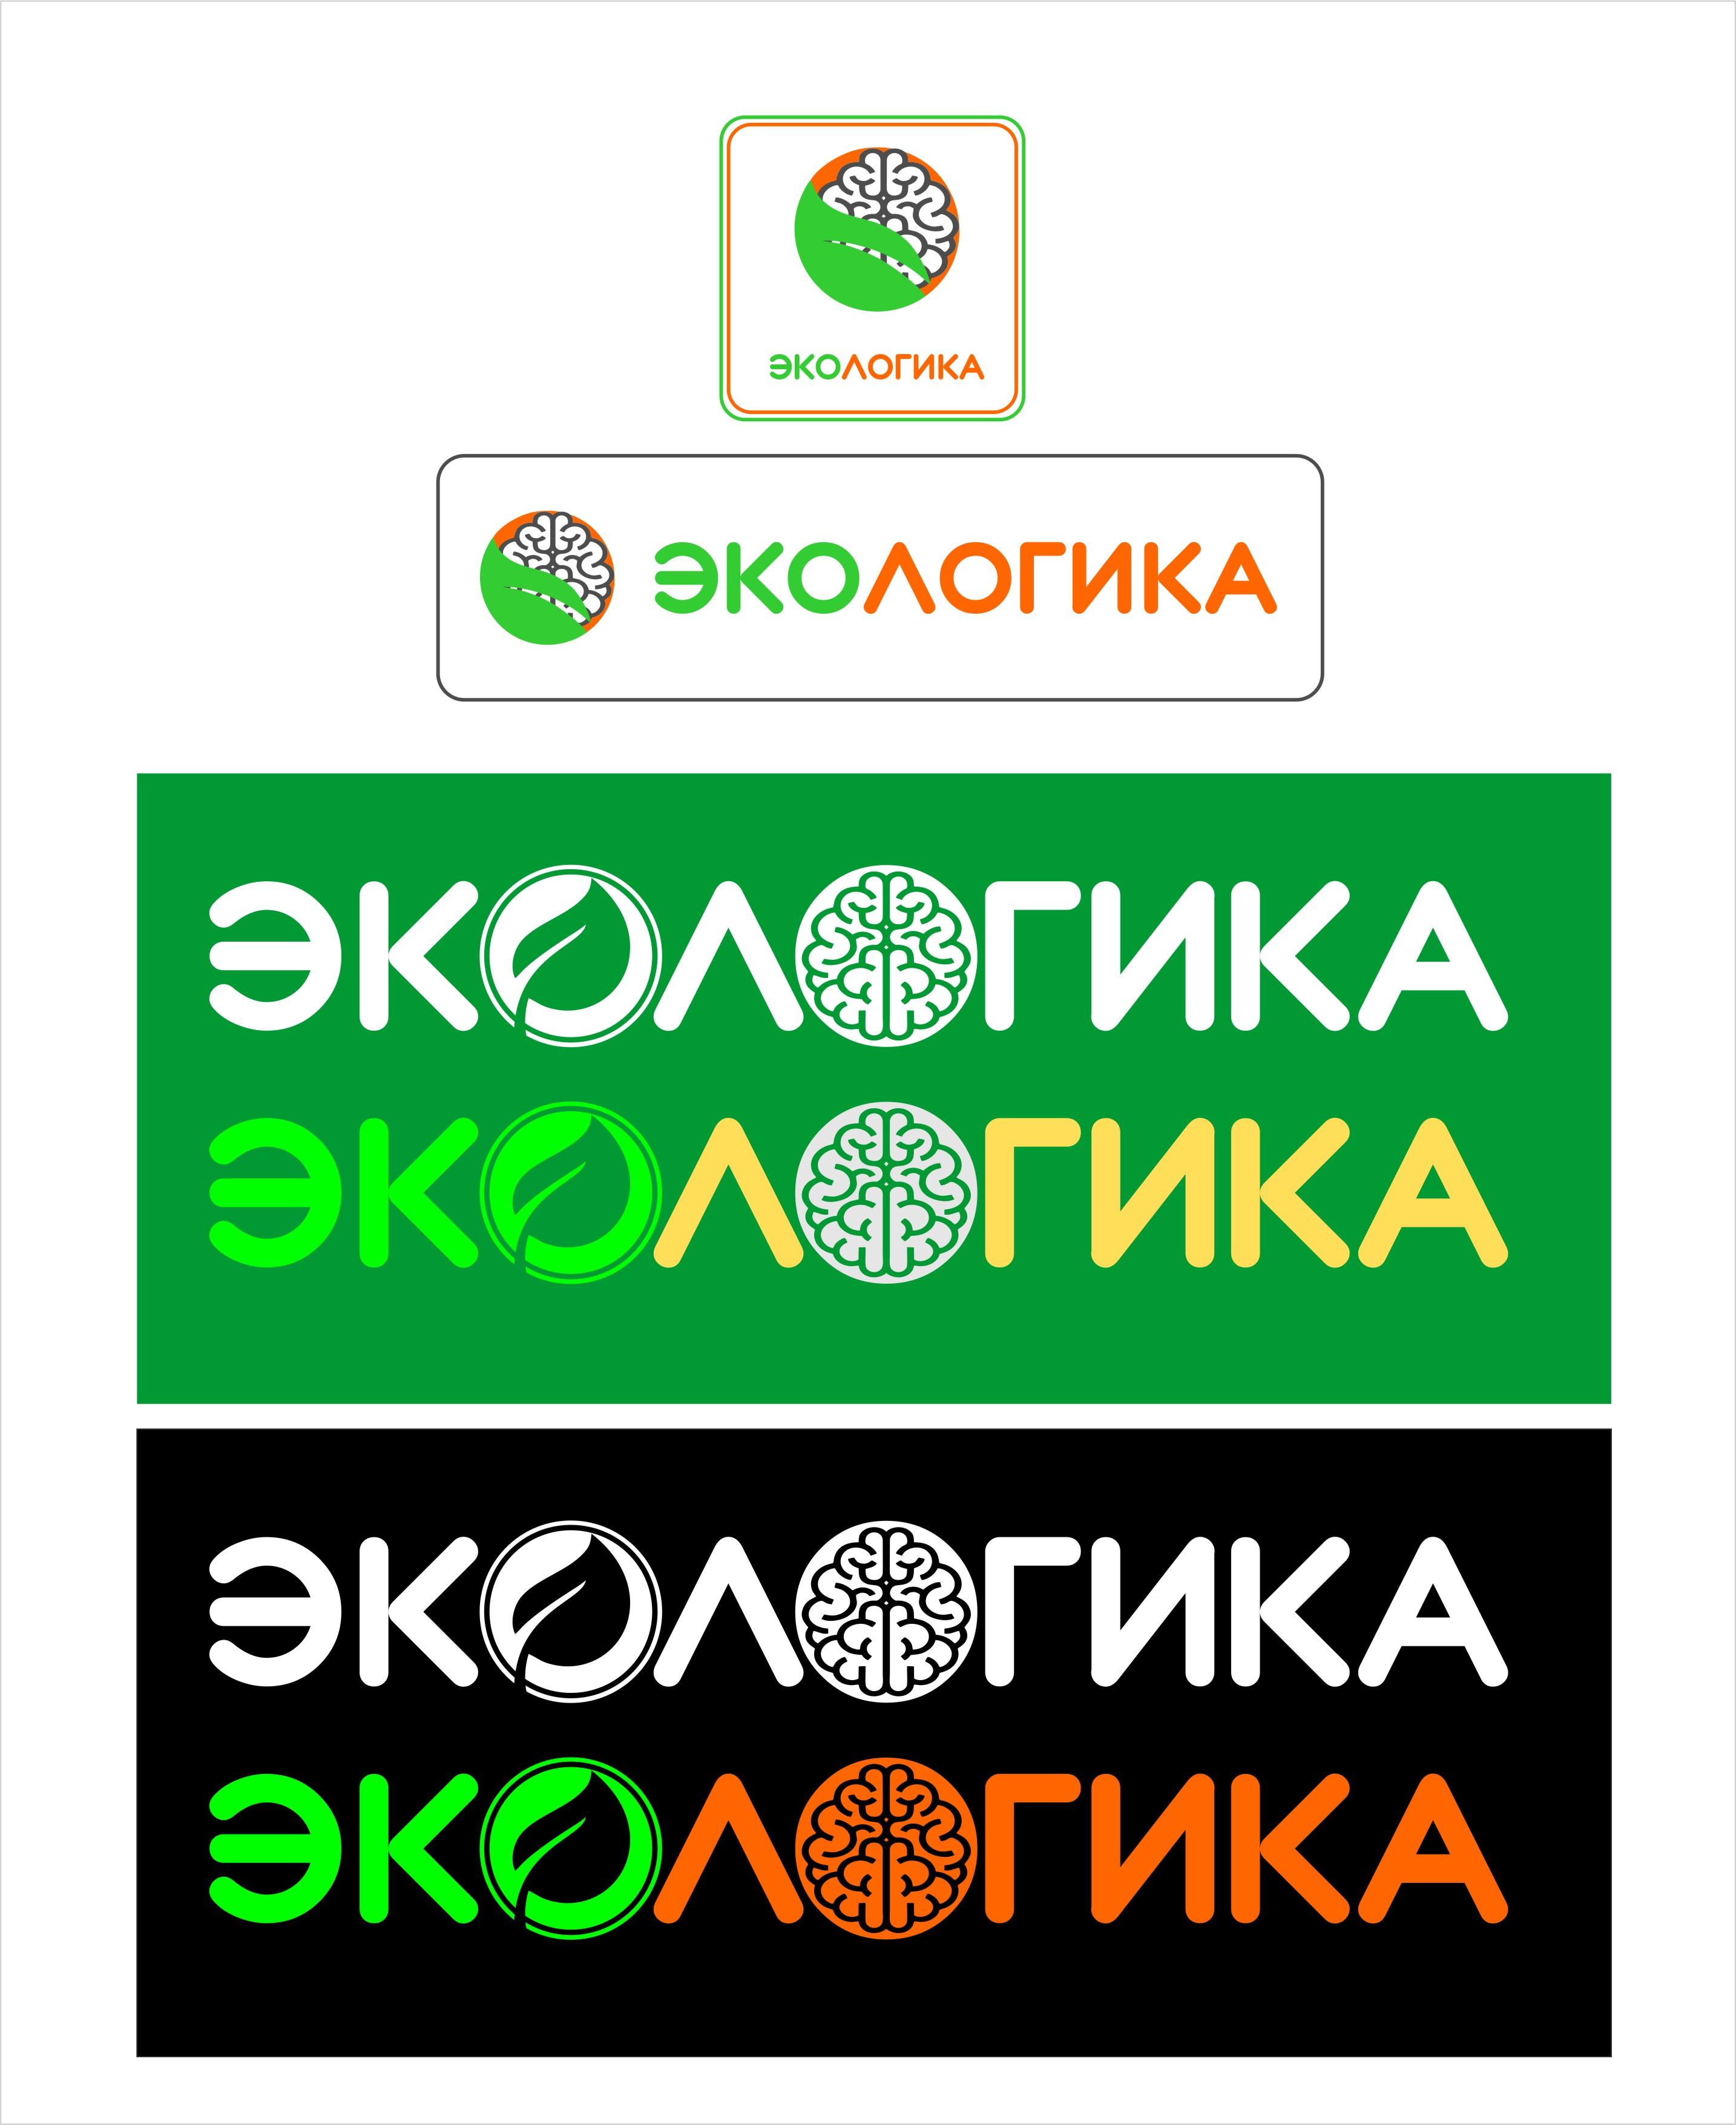 Логотип ЭКОЛОГИКА фото f_452594571878ca99.jpg